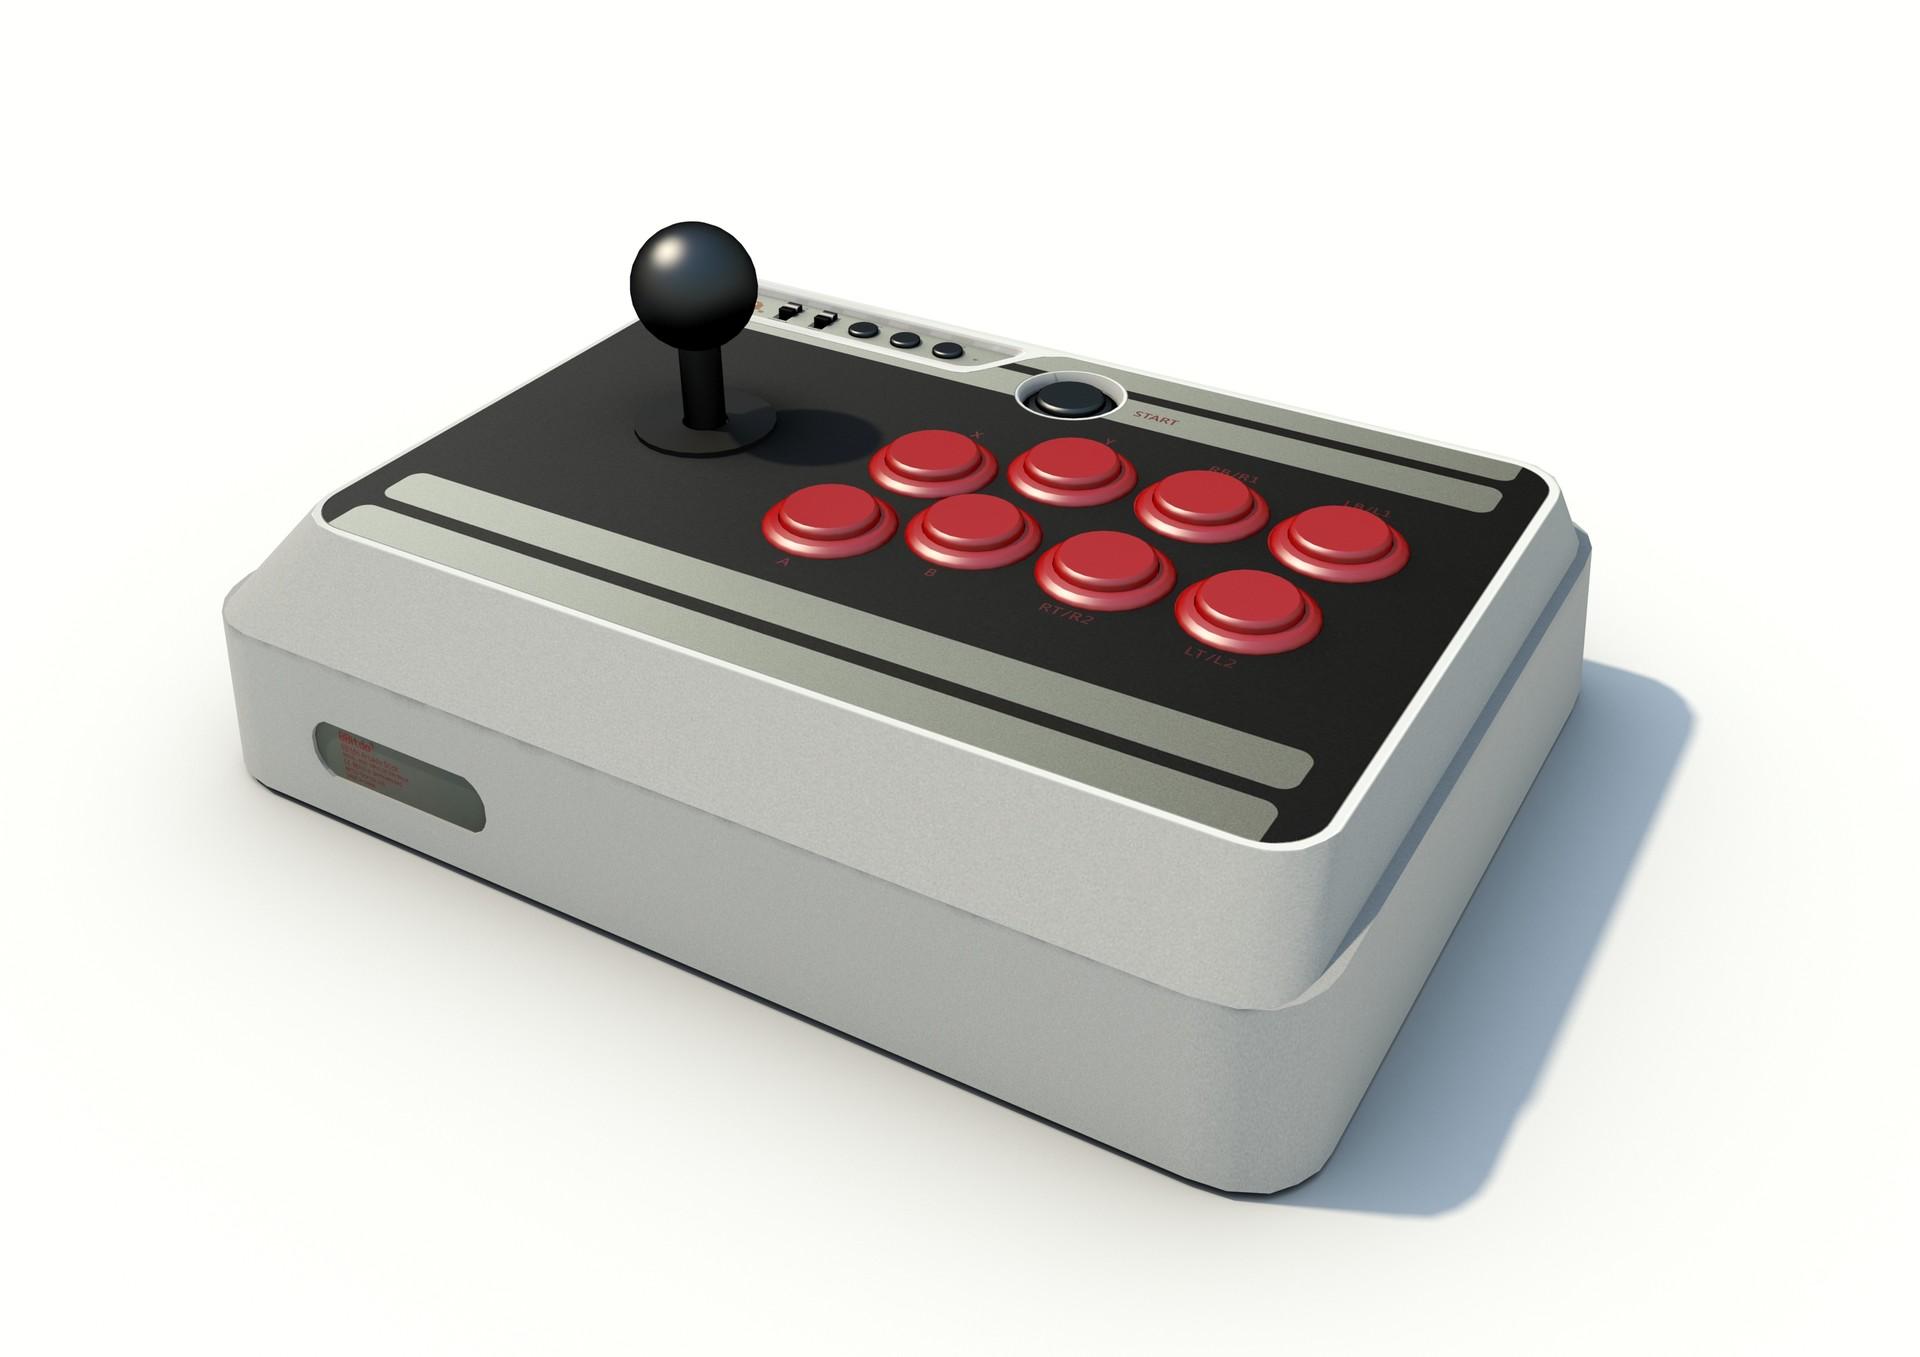 ArtStation - 8Bitdo N30 Arcade Stick, Bryan Ho